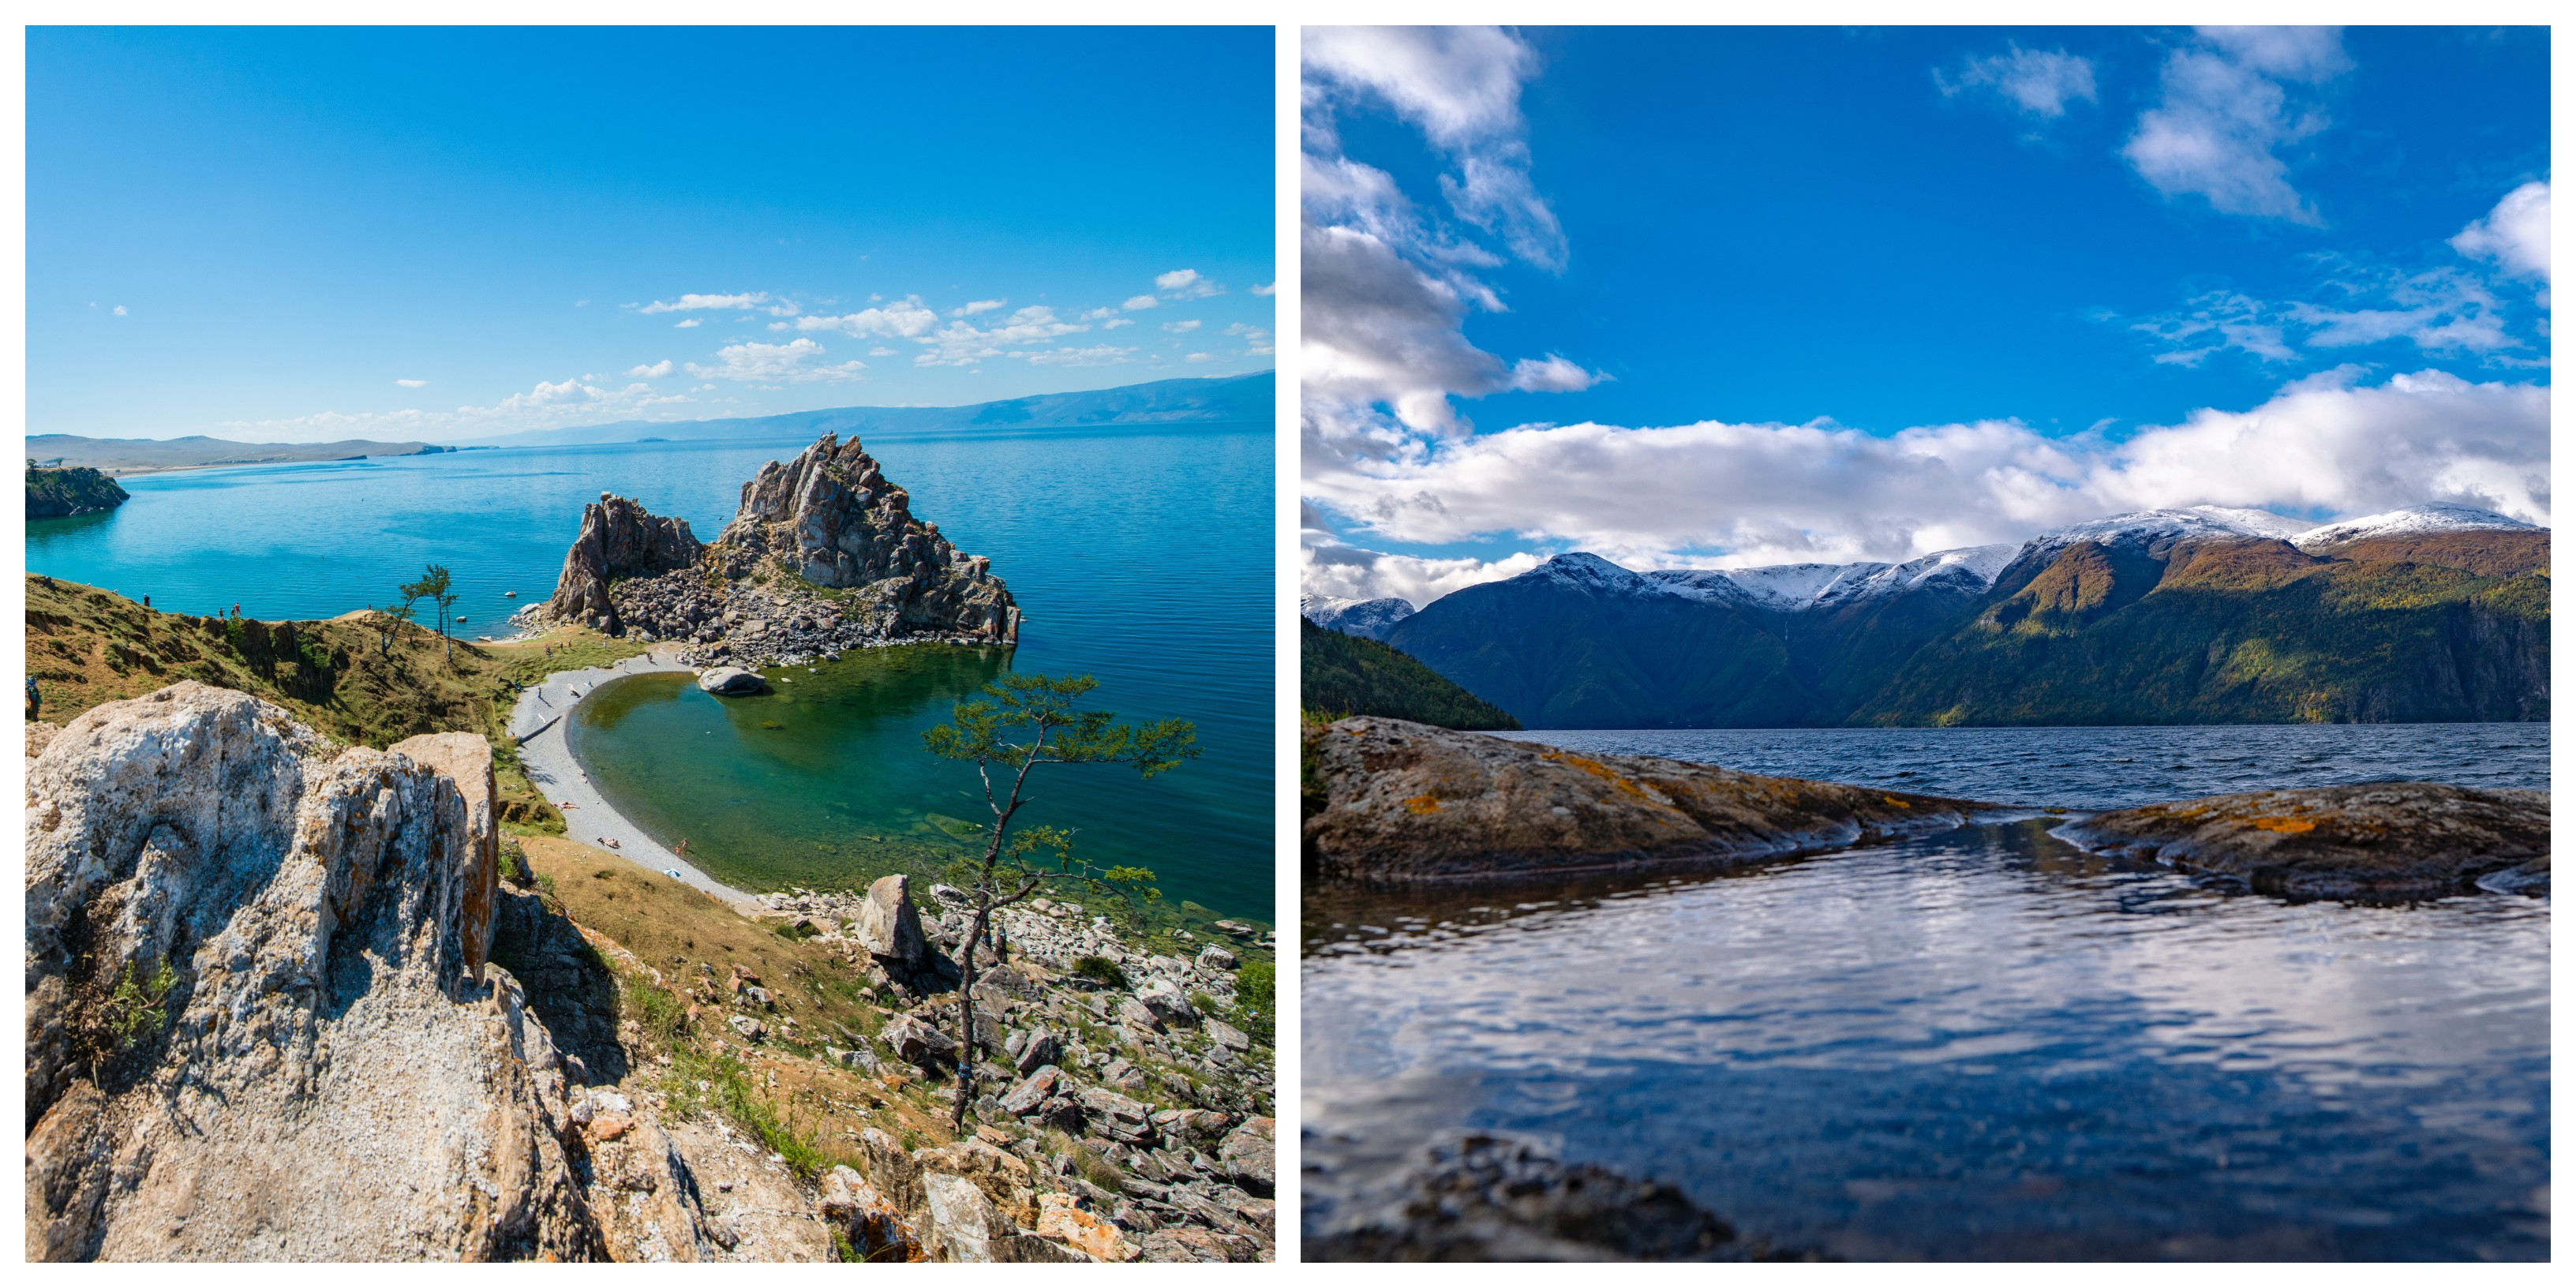 Где озеро Байкал?